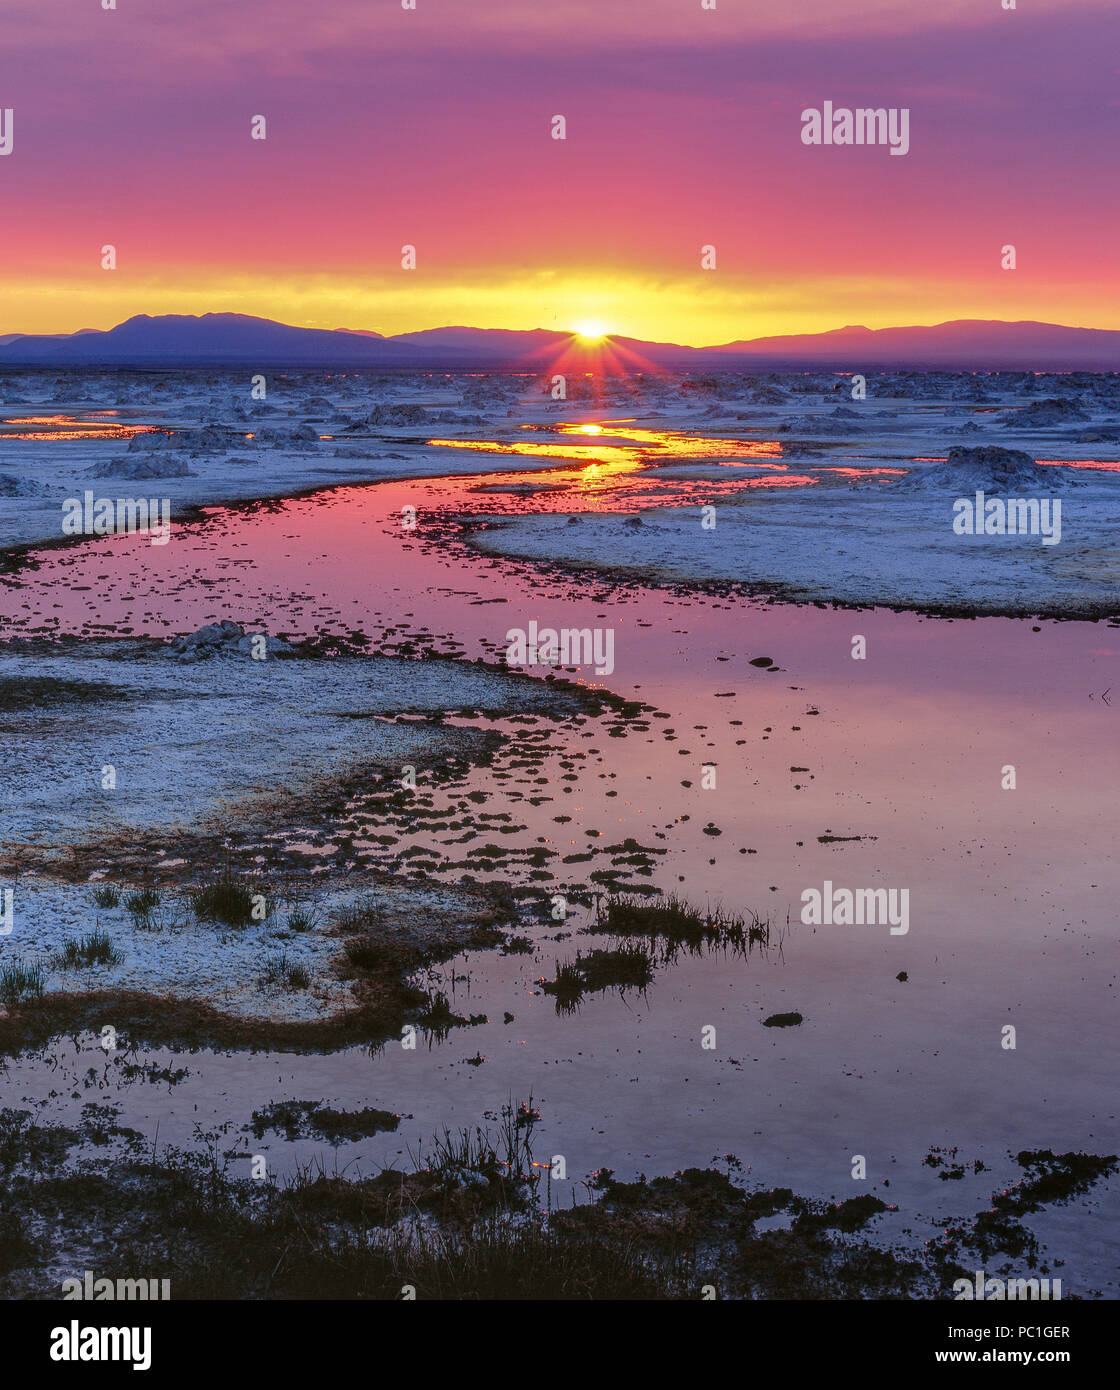 Sunrise, Mono Lake, Mono Basin National Forest Scenic Area, Inyo National Forest, California - Stock Image